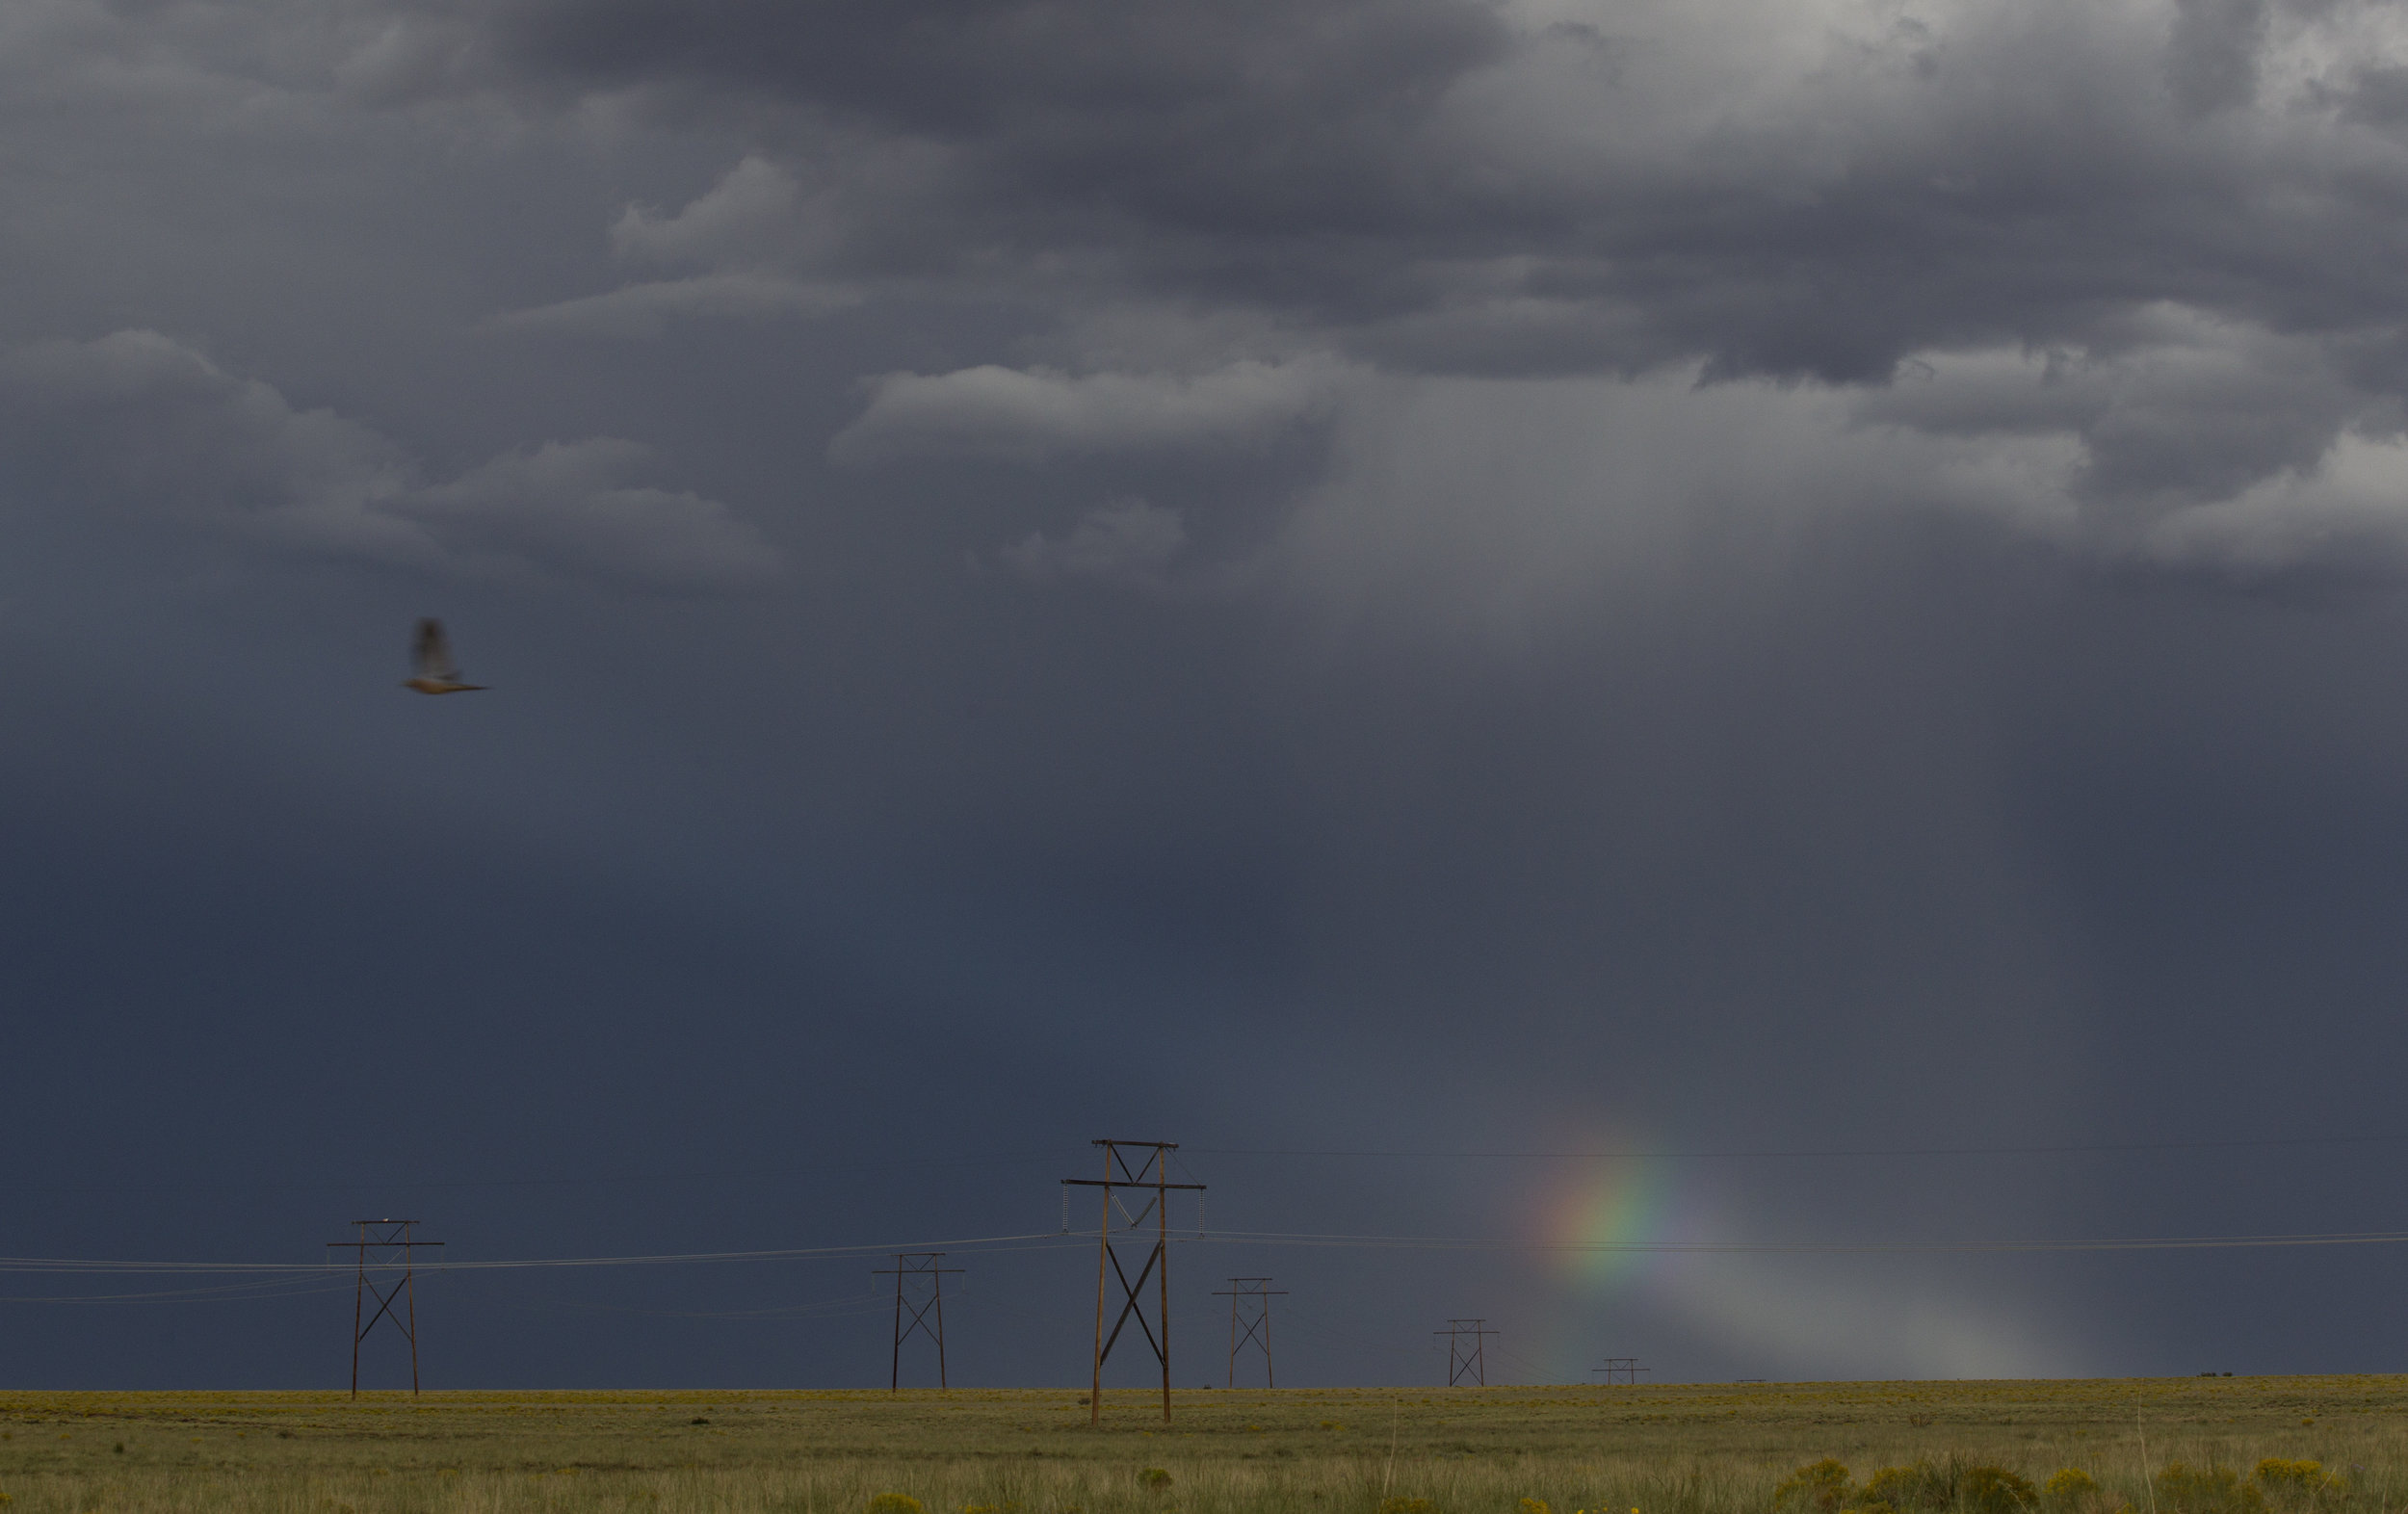 A bird flies past a rainbow during a thunderstorm on Saturday, Sept. 10, 2016,near Albuquerque, N.M.(Kevin Martin)